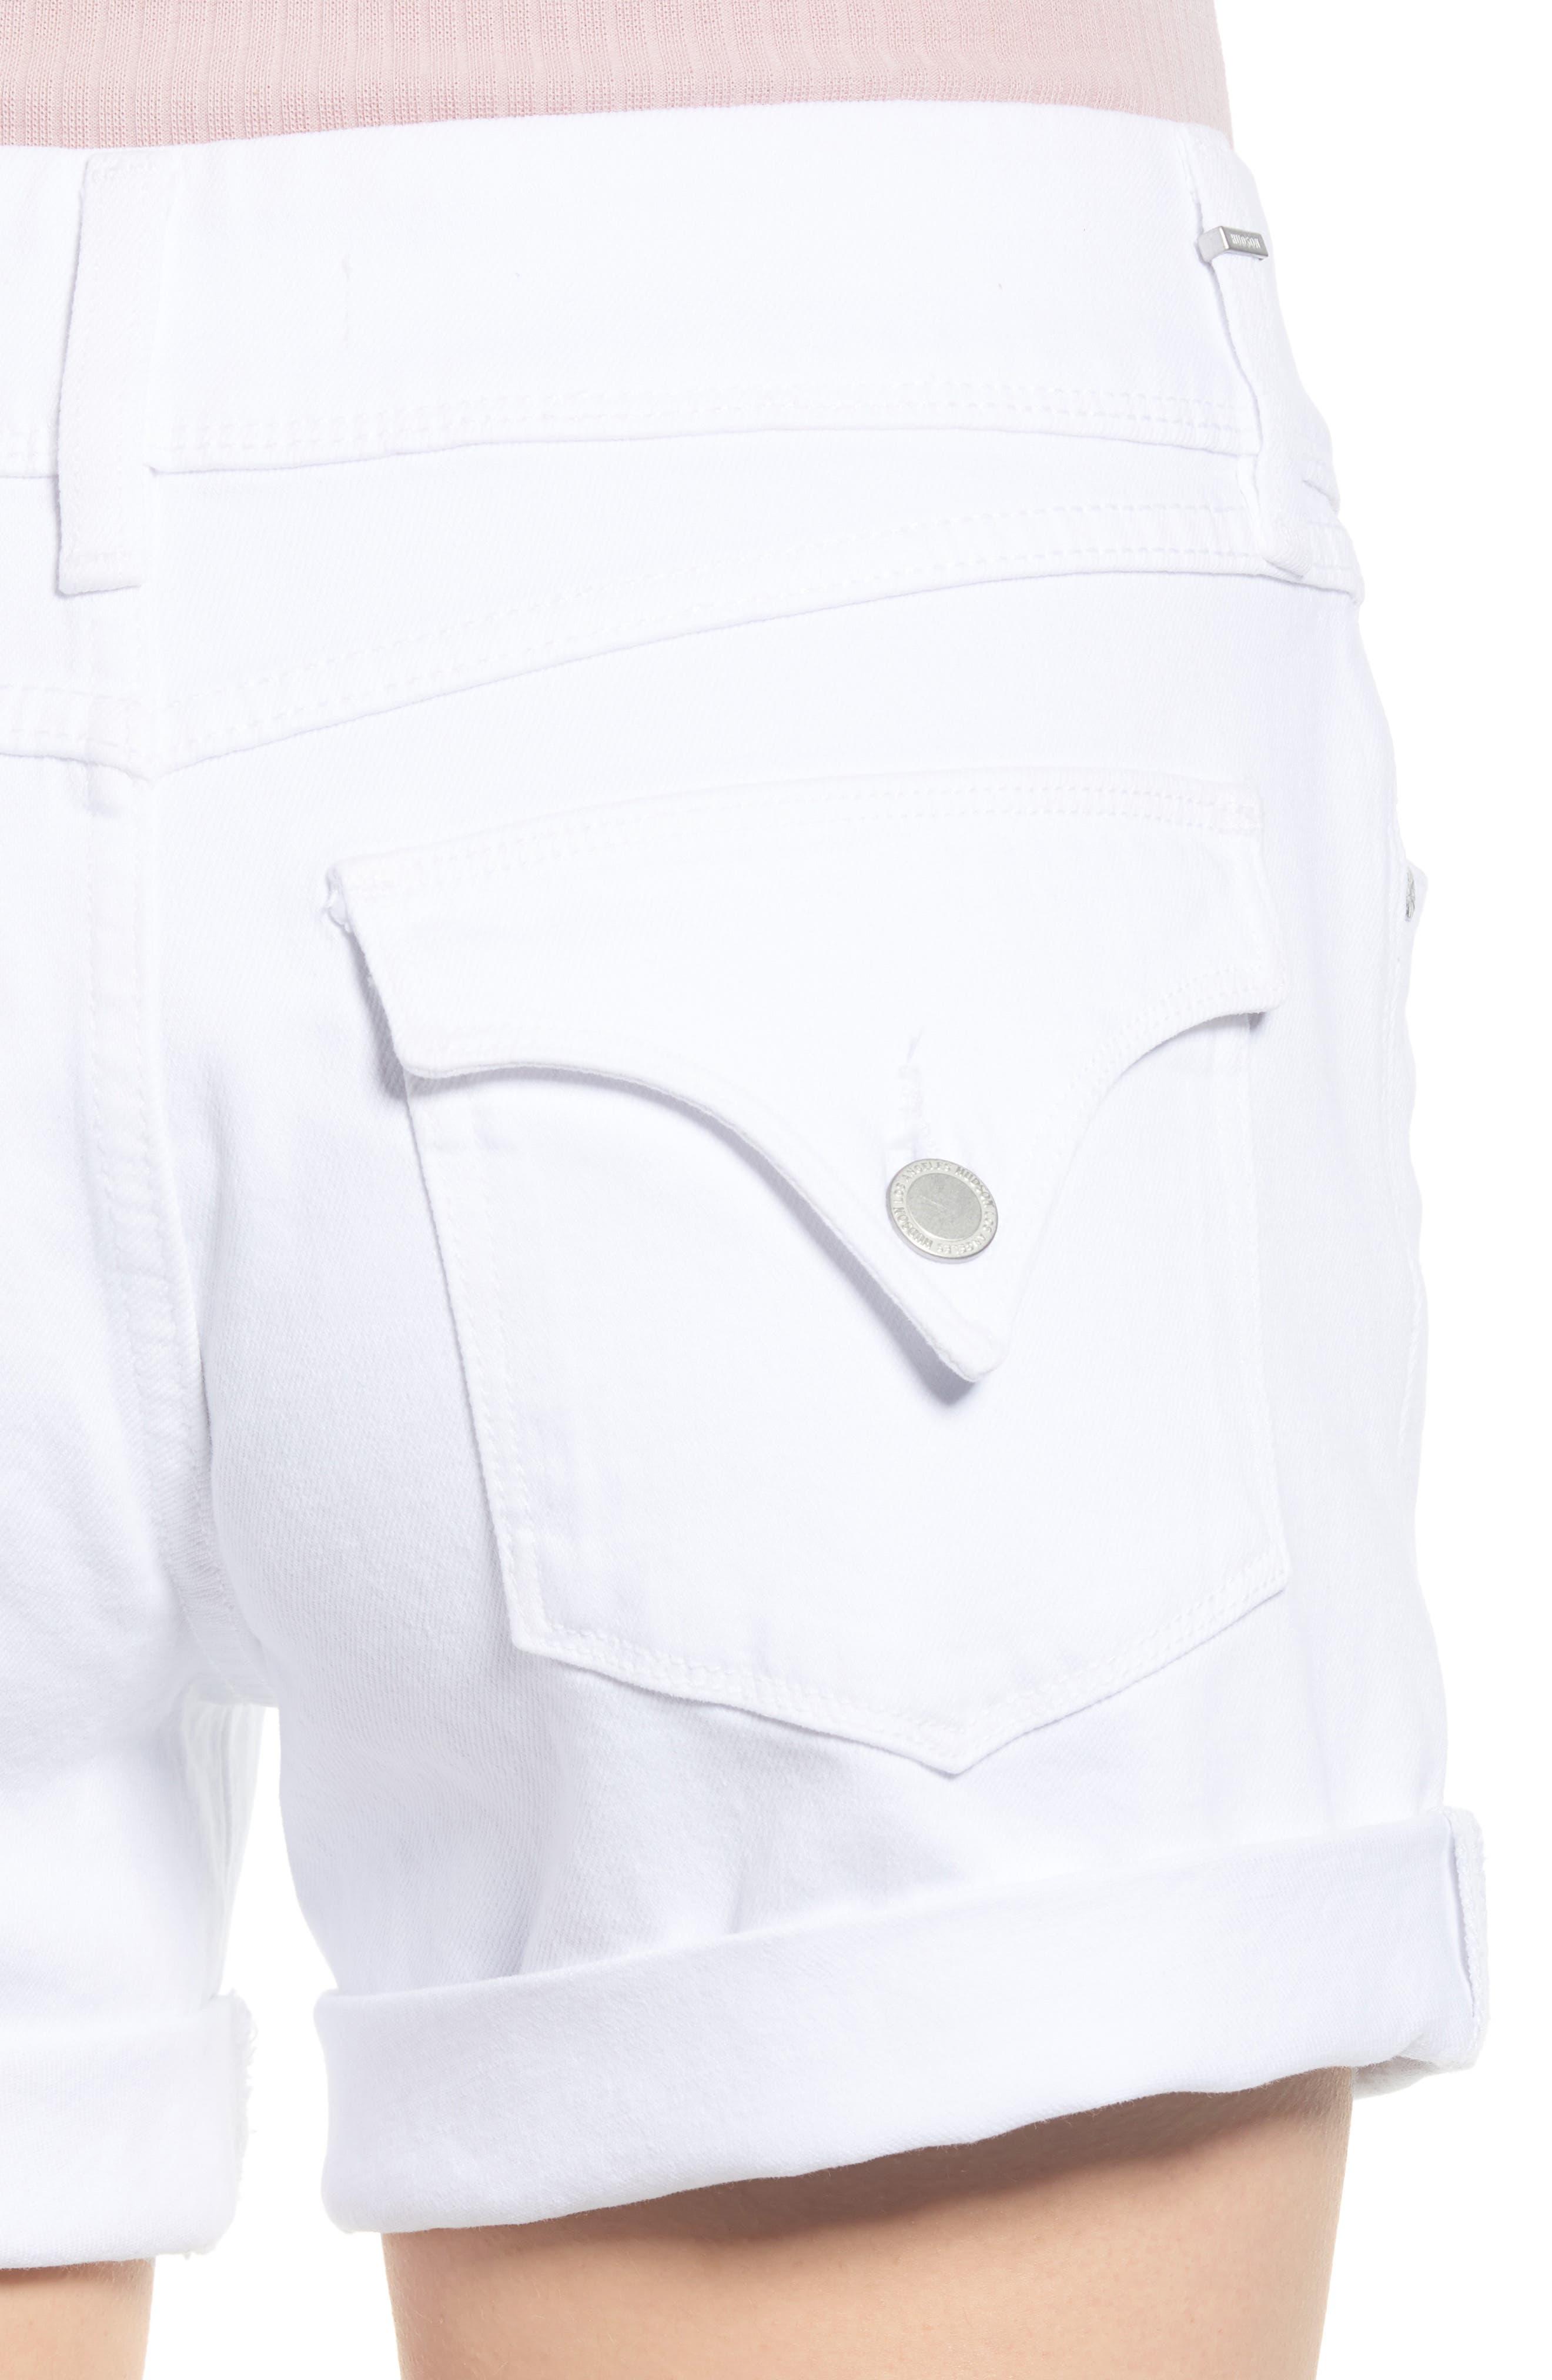 HUDSON JEANS, Croxley Cuff Denim Shorts, Alternate thumbnail 5, color, WHITE 2